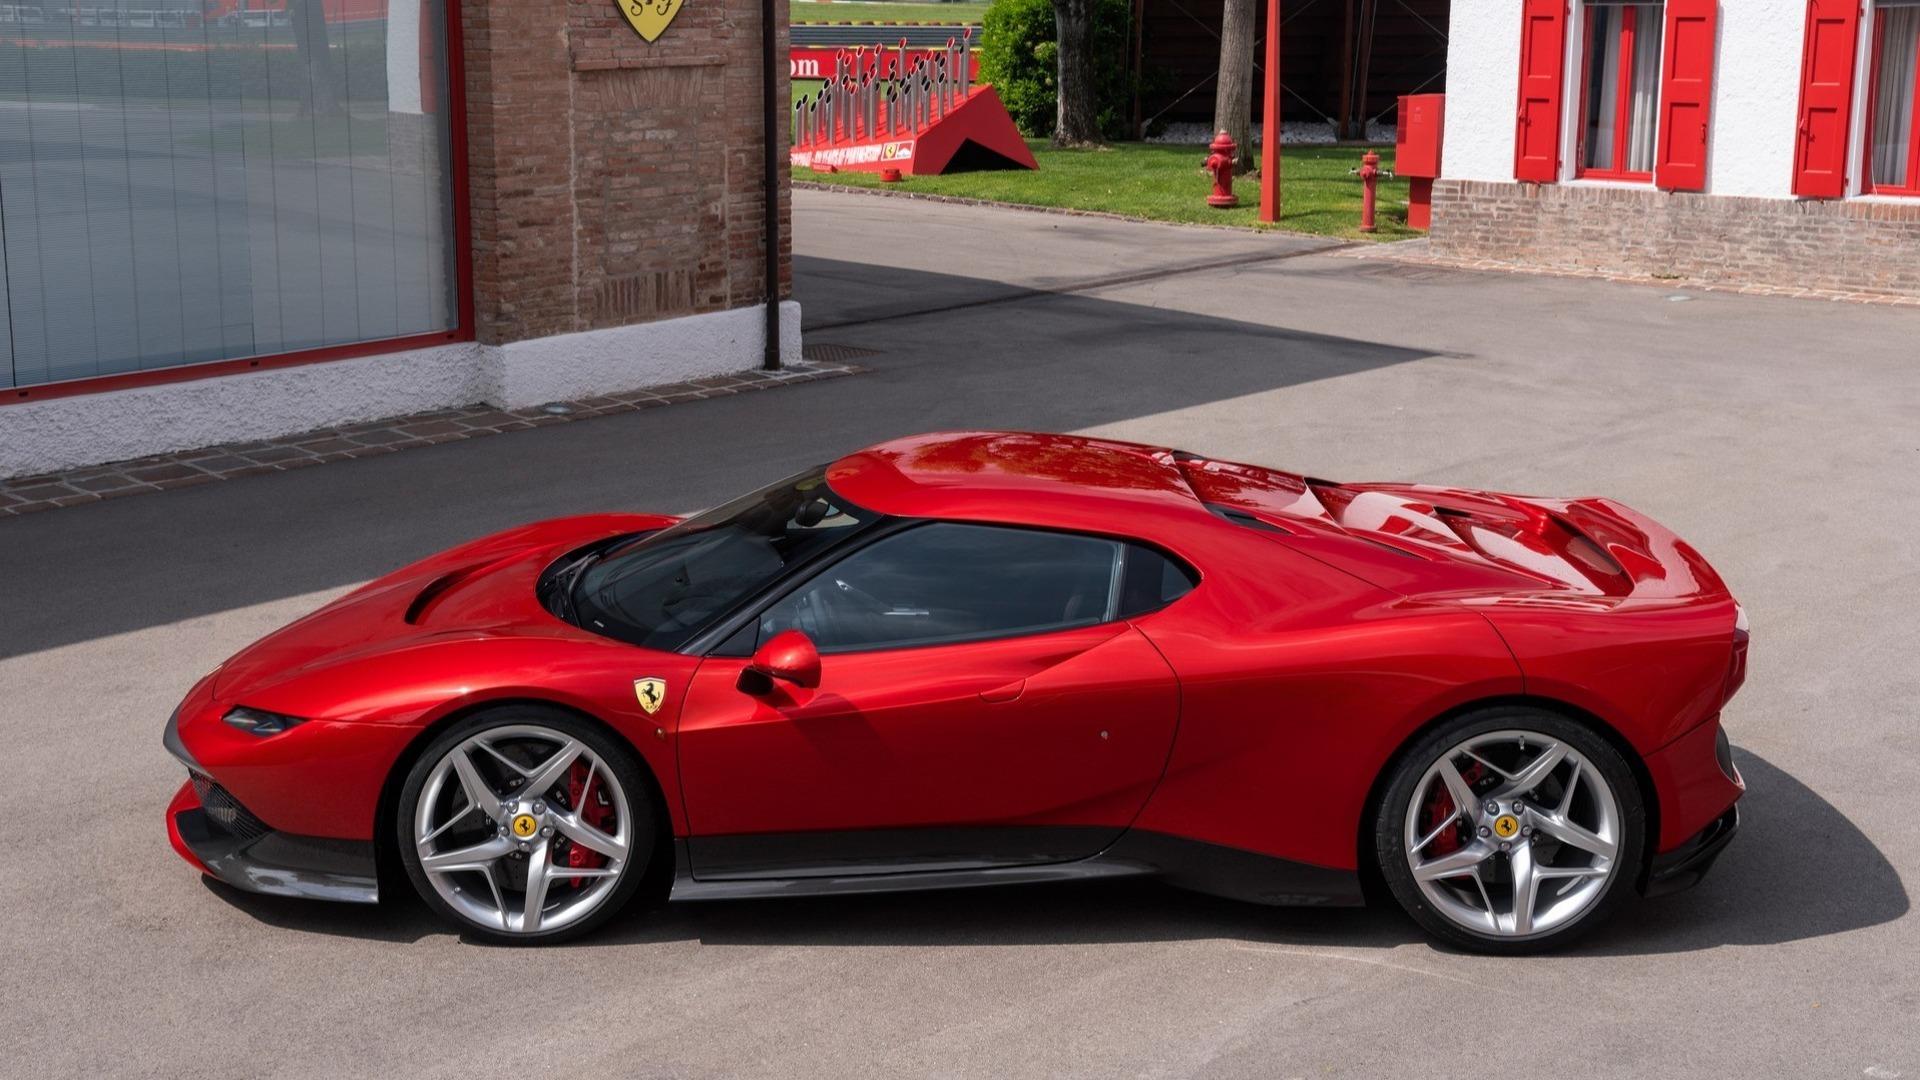 Ferrari Sp38 One Off 3